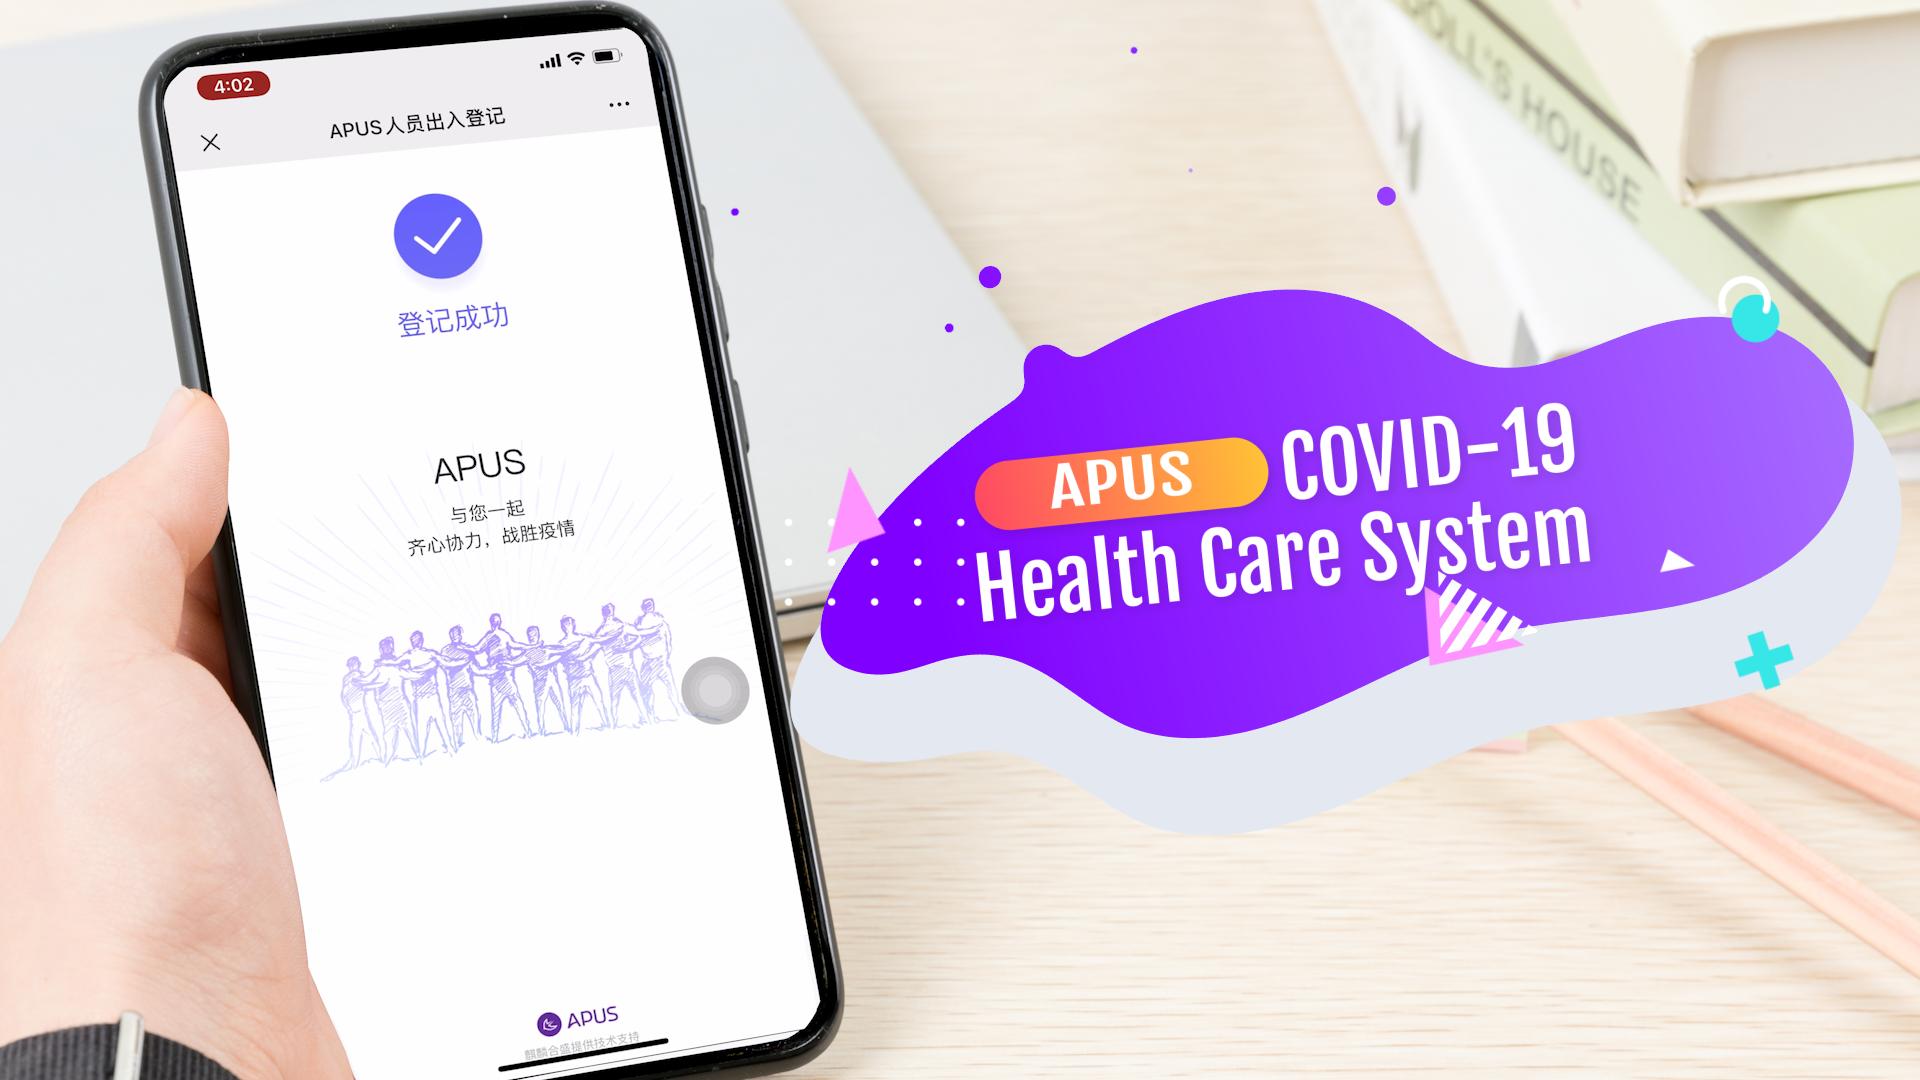 APUS COVID-19 Health Care System